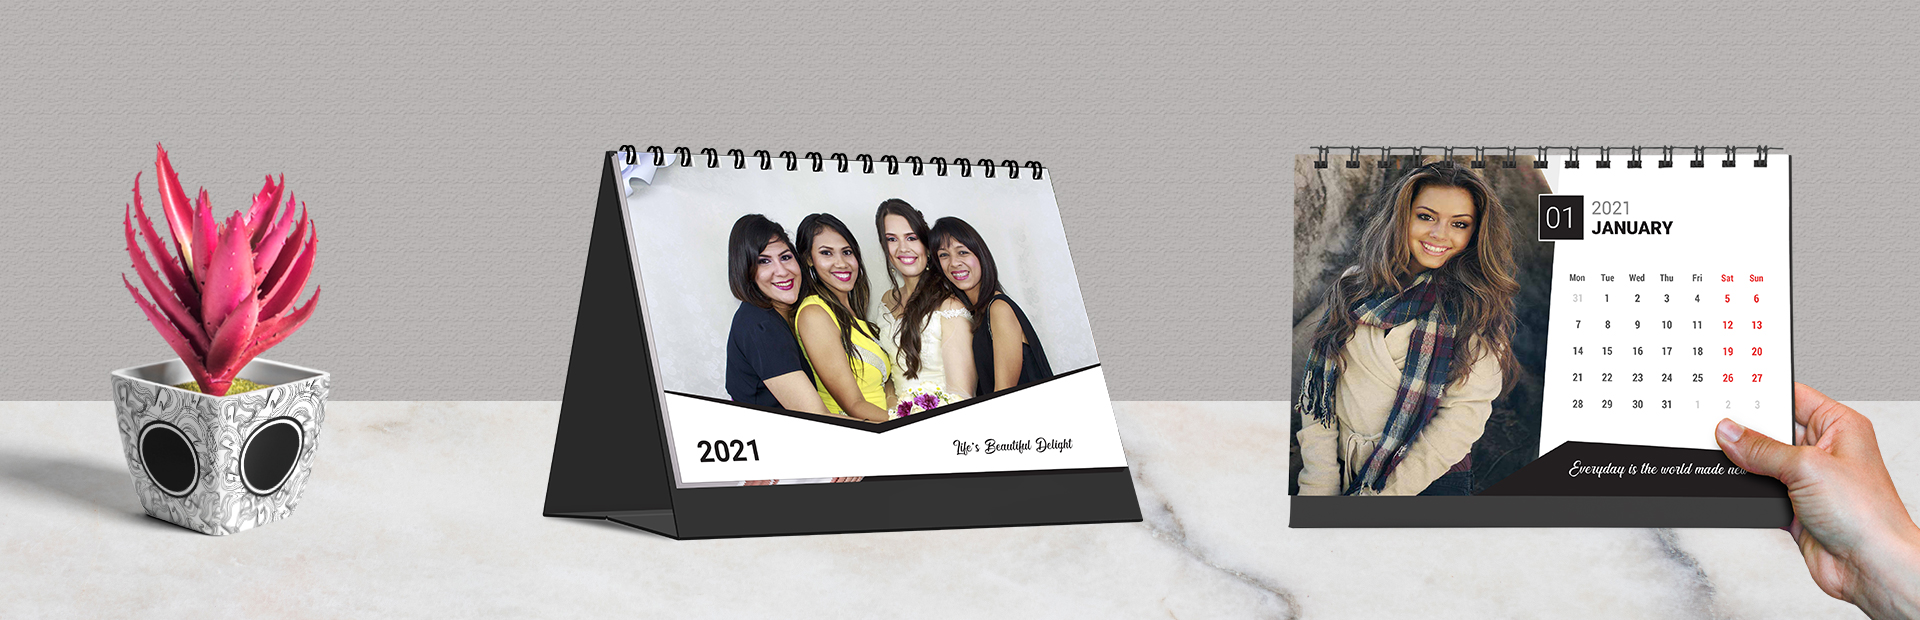 Classic Monochrome Photo Calendars Online